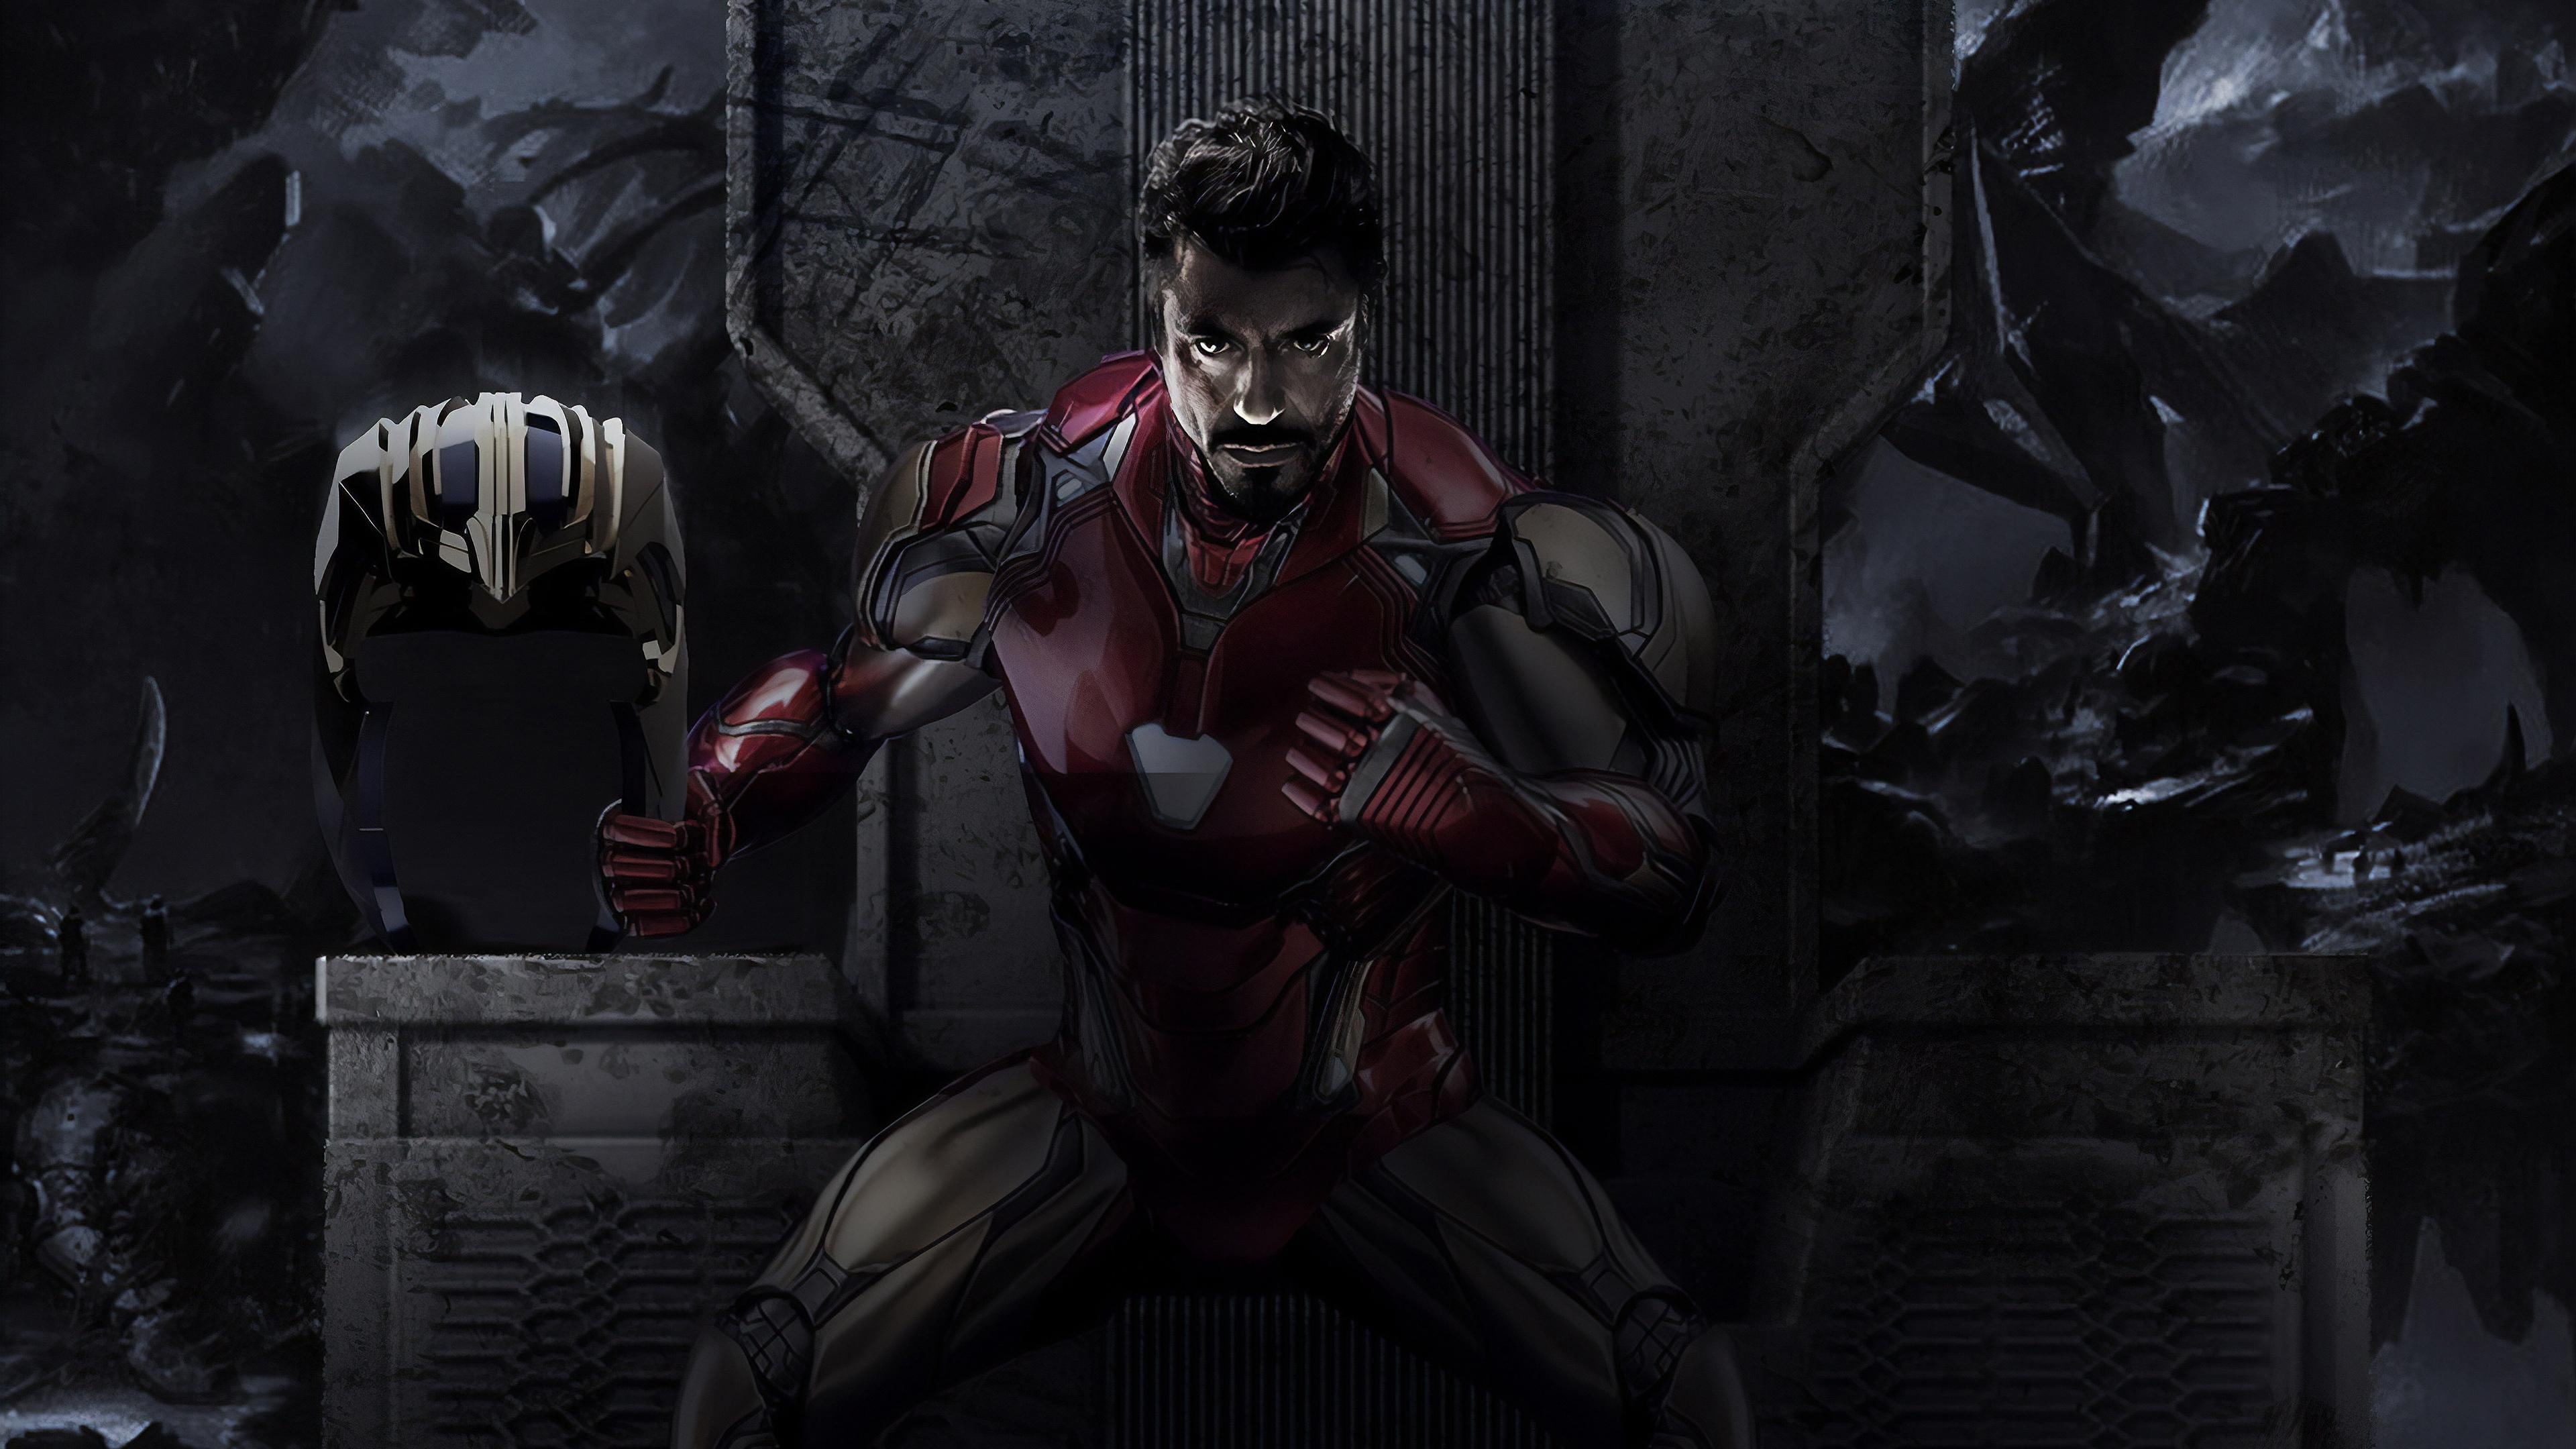 Wallpaper 4k Iron Man Endgame 4k 4k Wallpapers Artwork